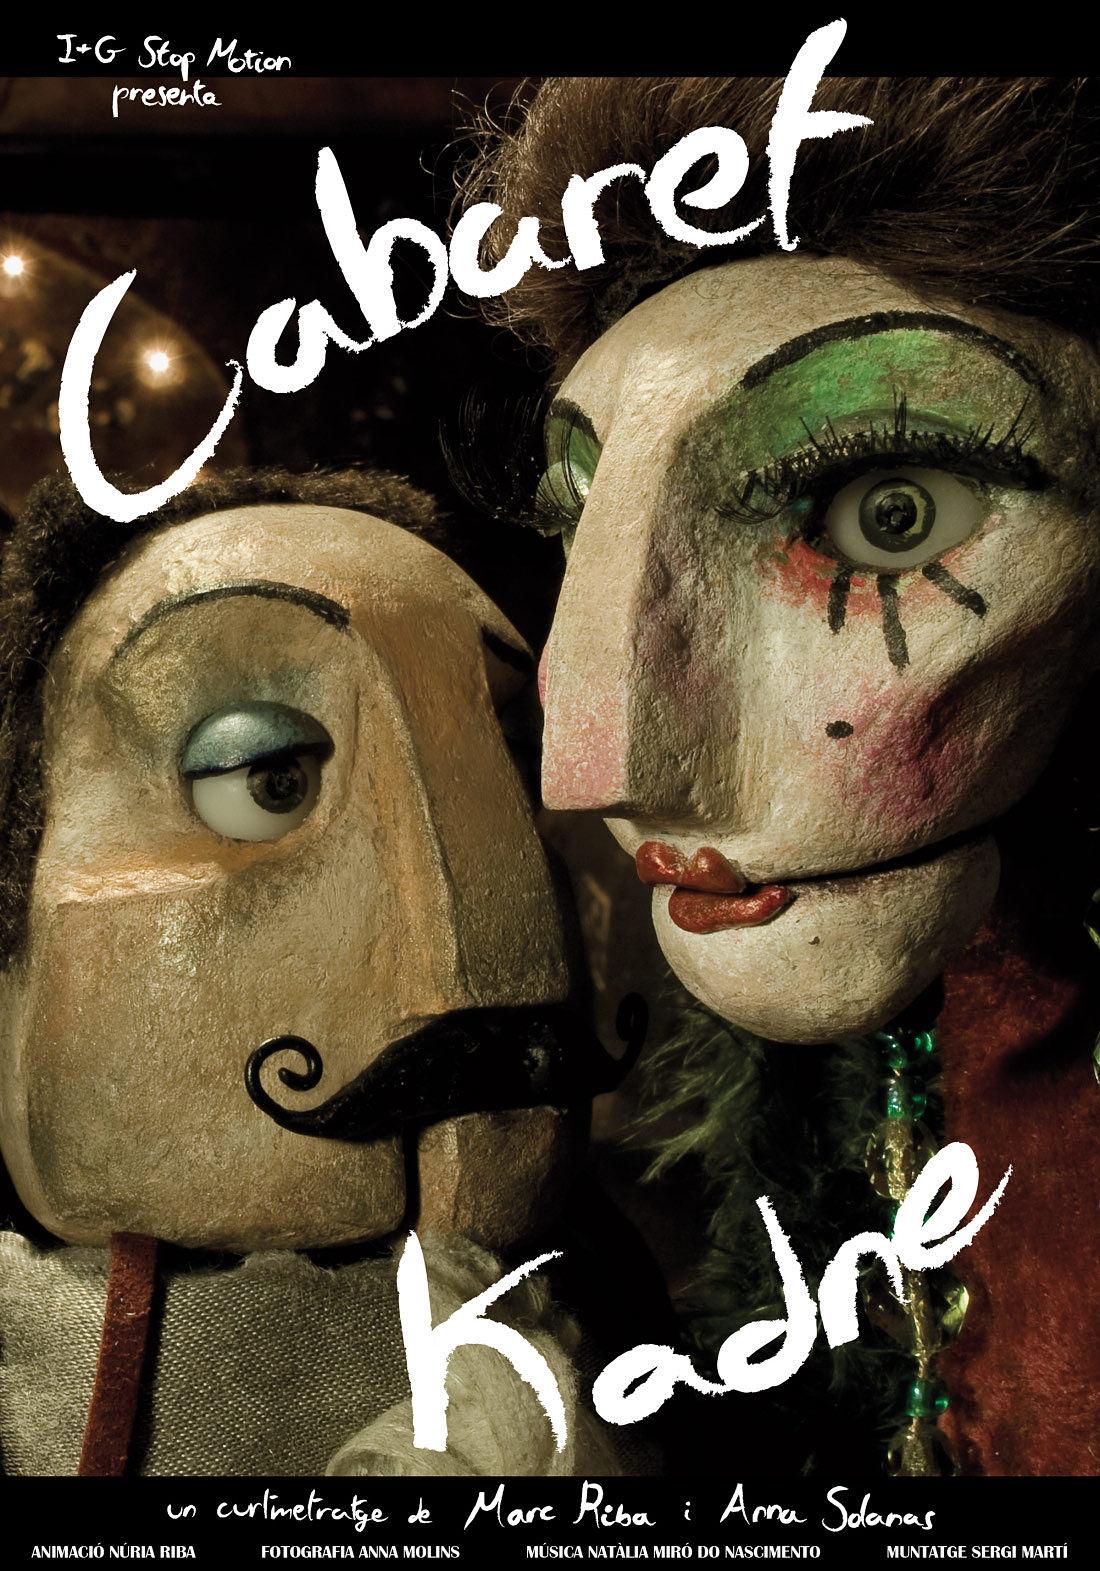 08 Cabaret Kadne_res_opt